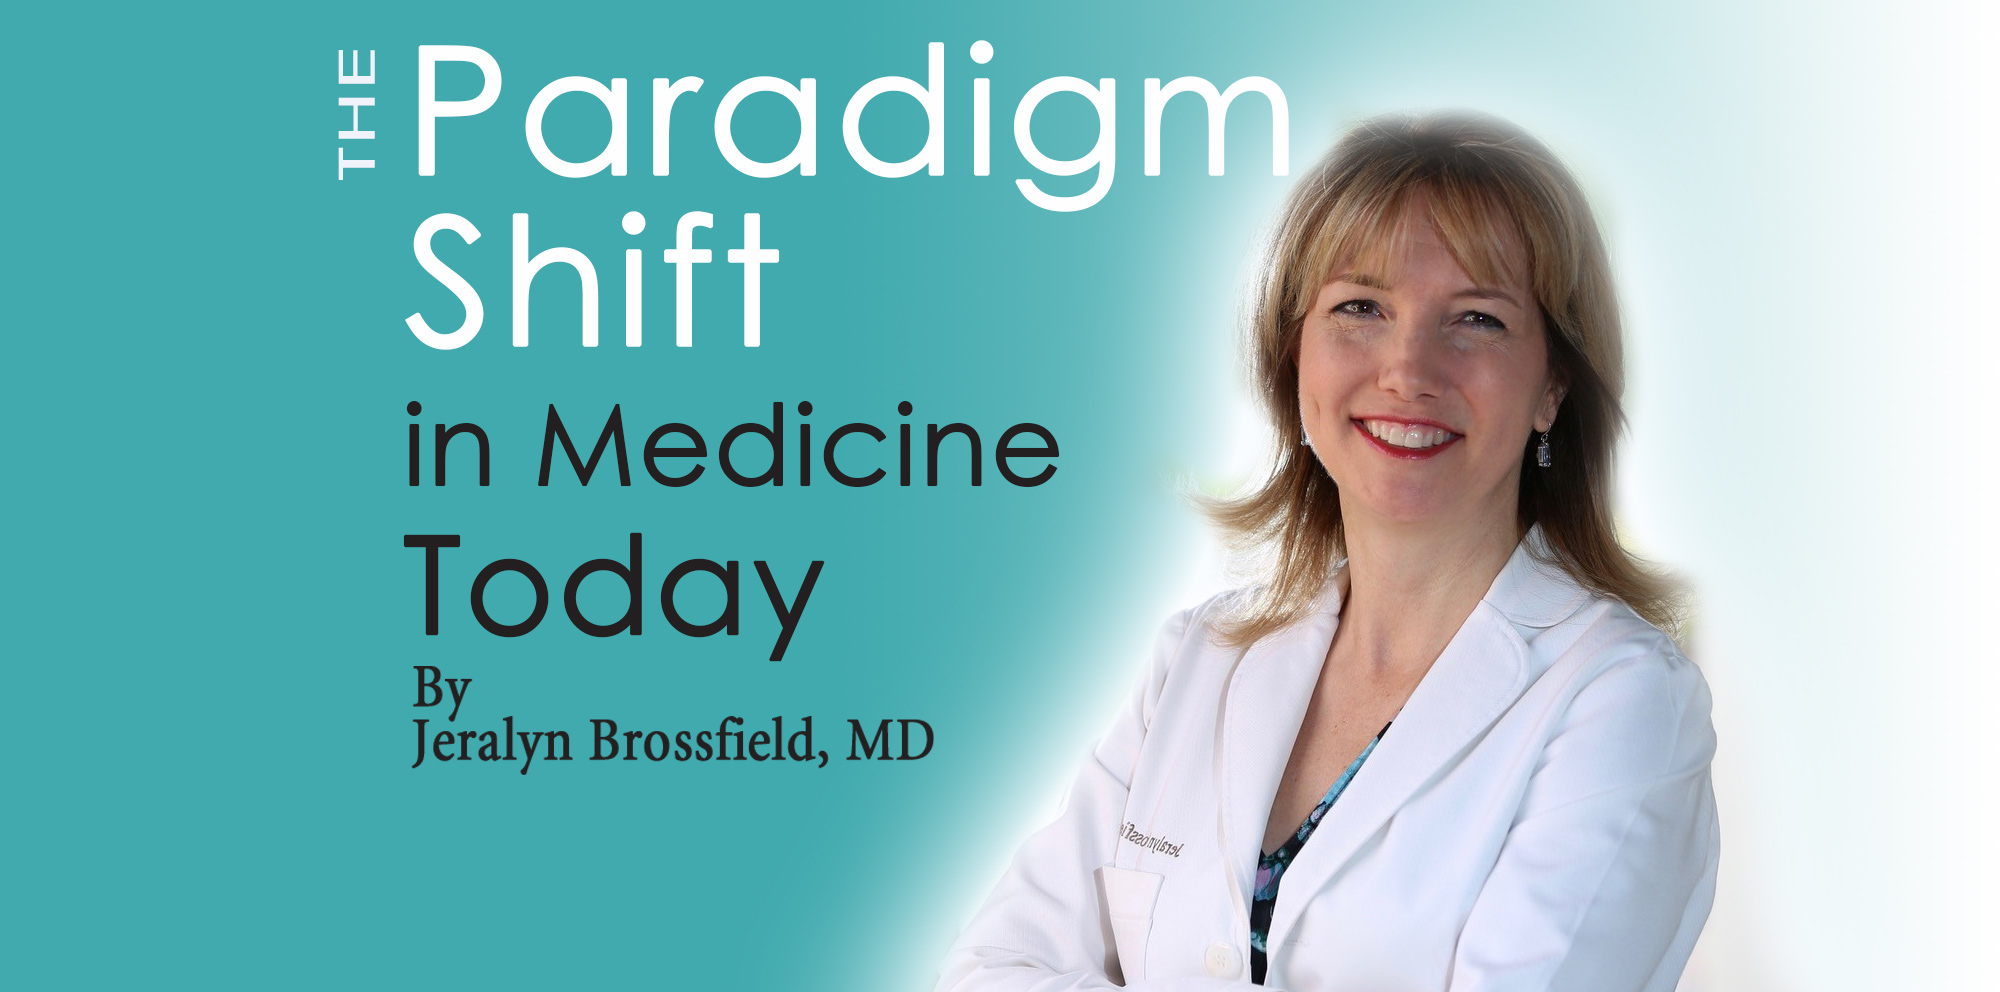 The Paradigm Shift in Medicine Today